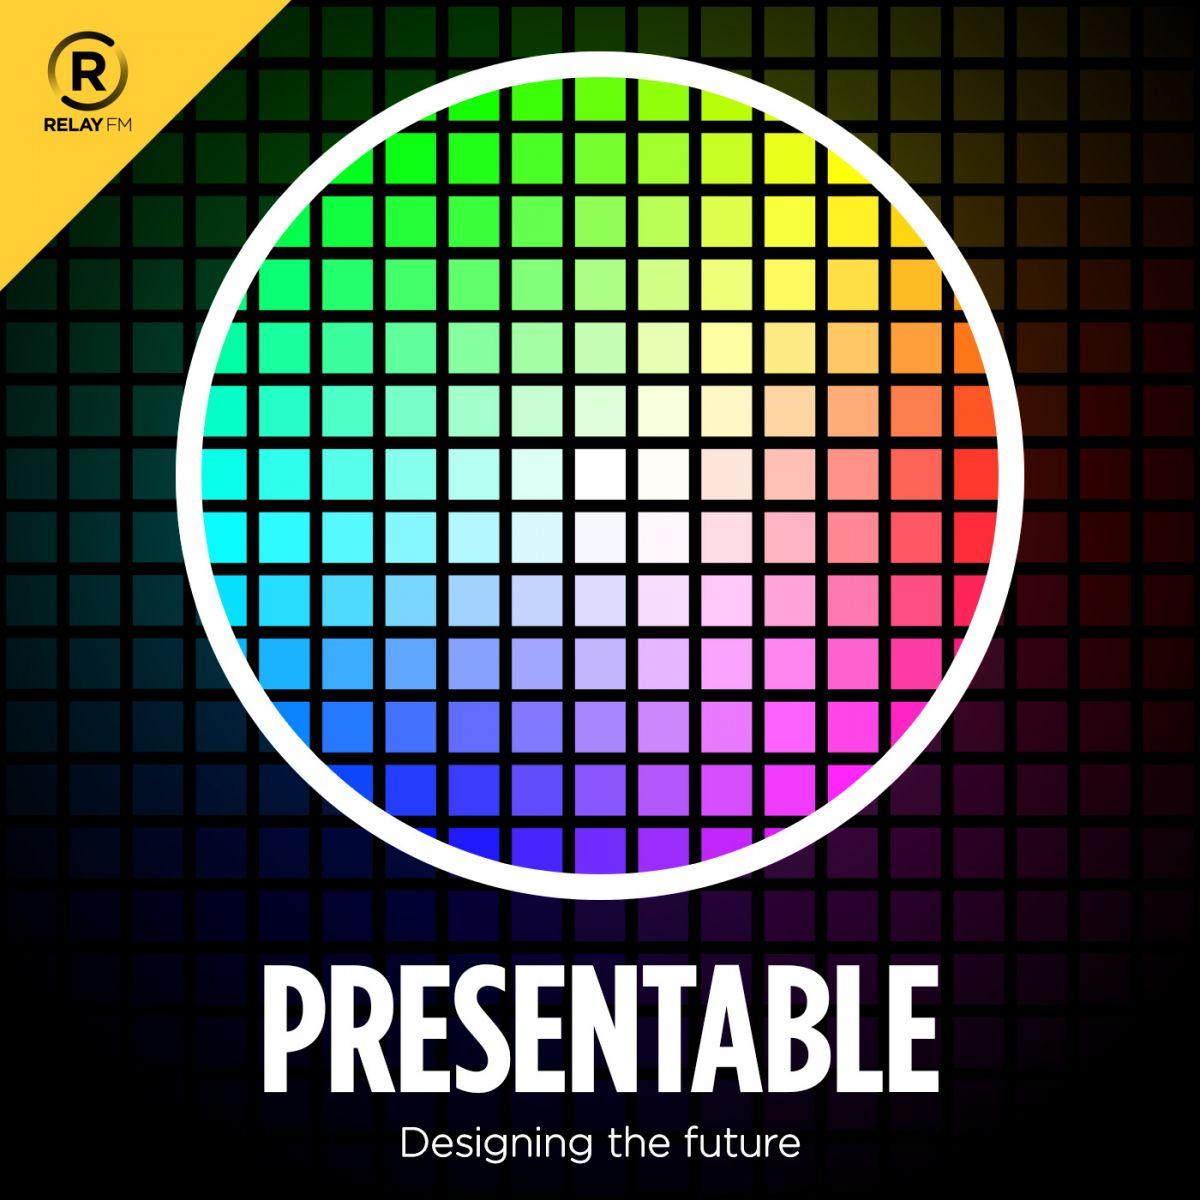 Artwork Presentable Podcast